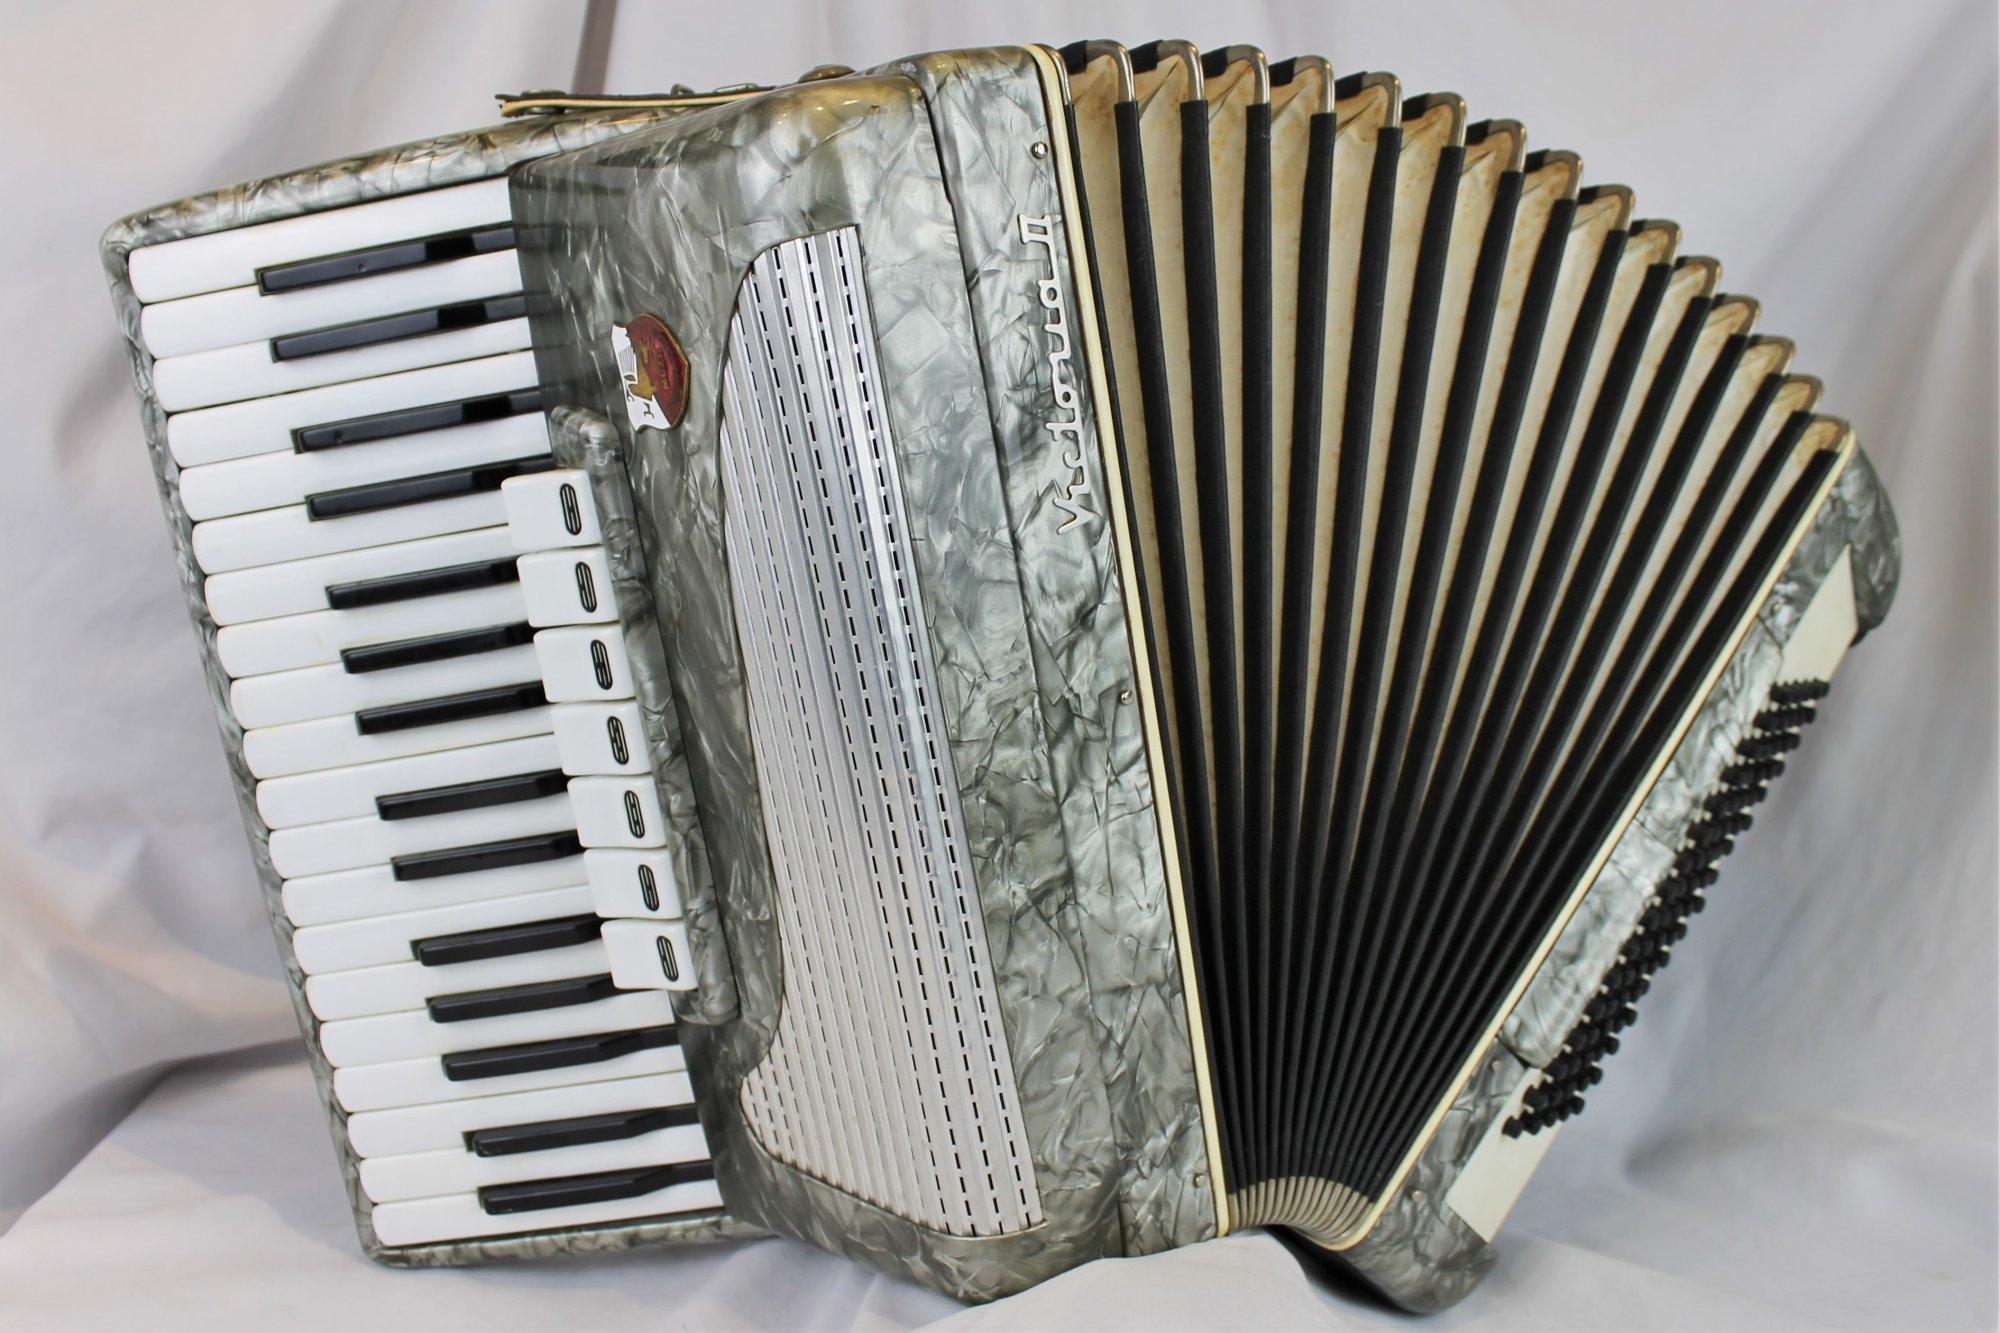 4869 - Silver Muza Victoria II Piano Accordion LMM 34 80